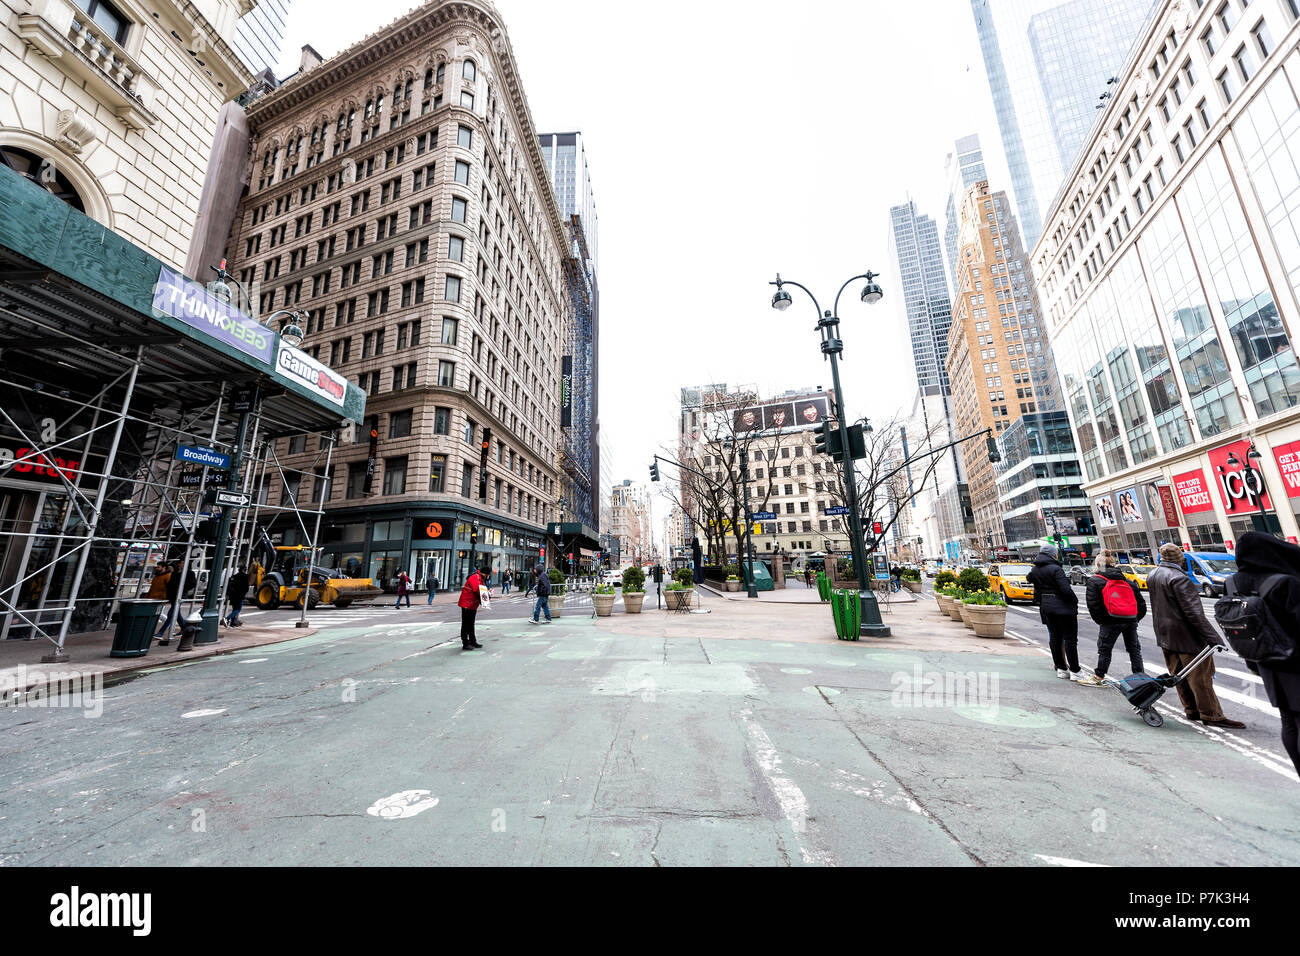 Sixth Avenue New York Shopping Stockfotos & Sixth Avenue New York ...